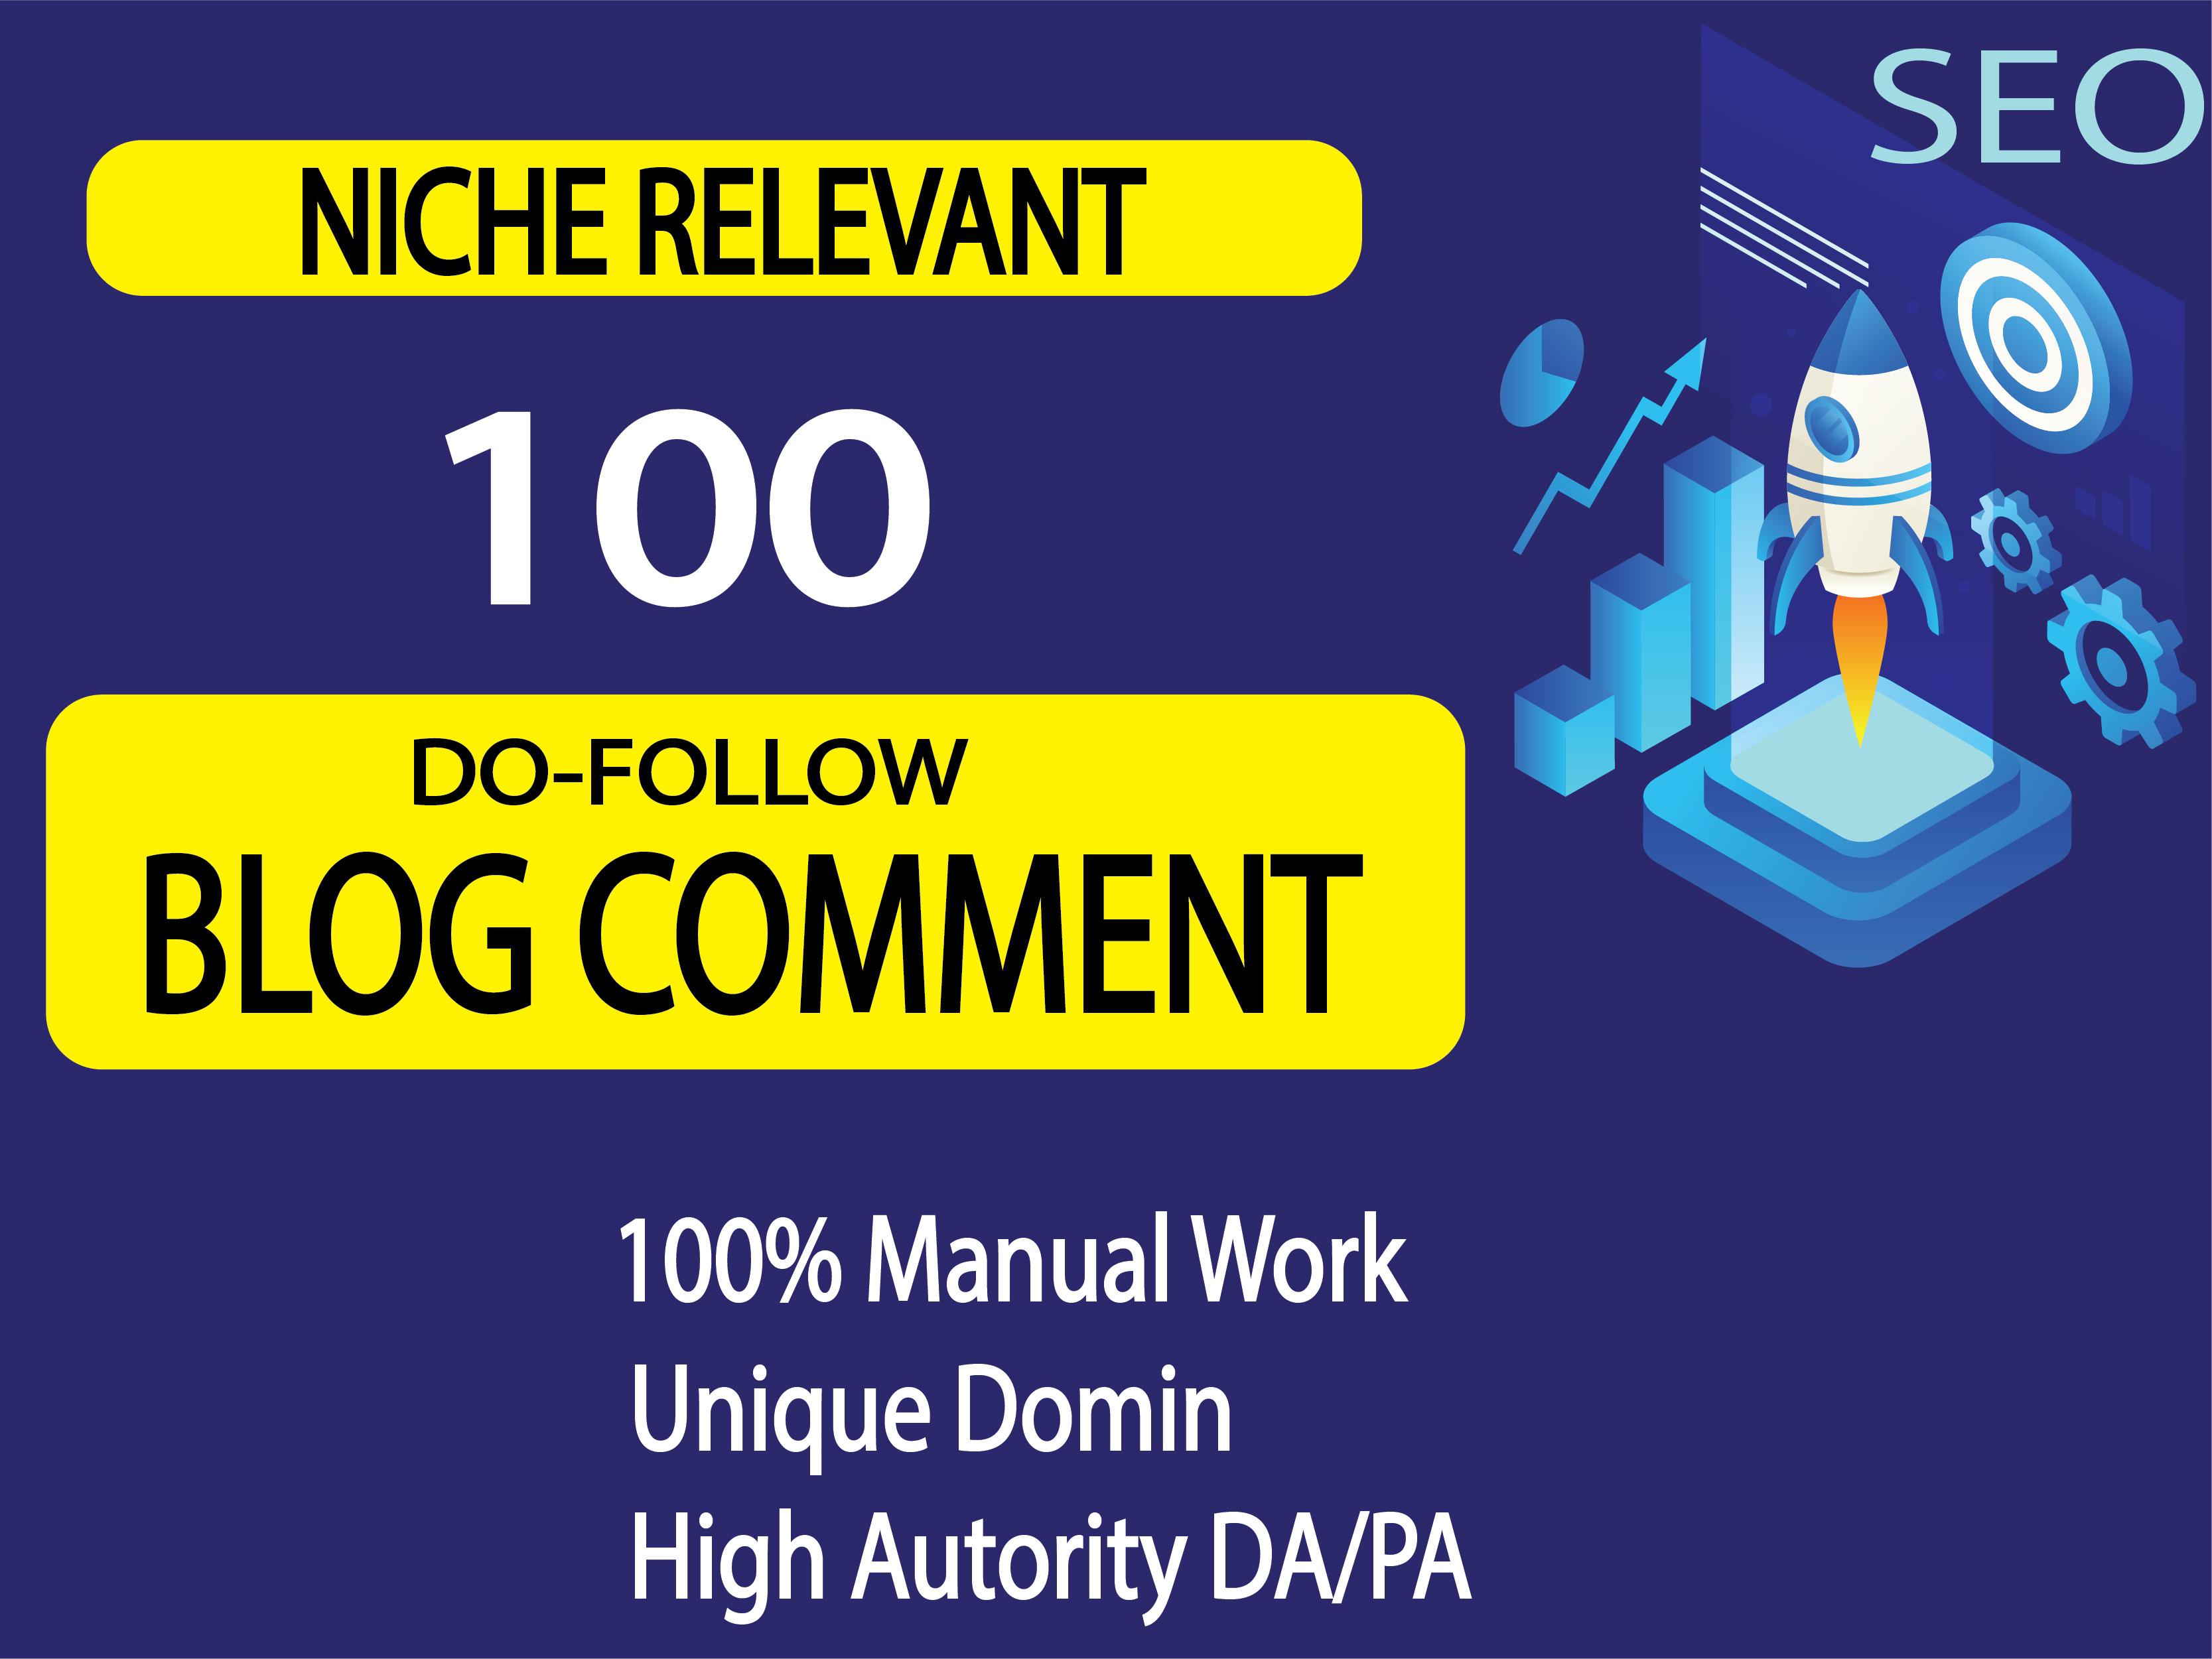 I will provide Manually 100 Blog commenting SEO backlinks